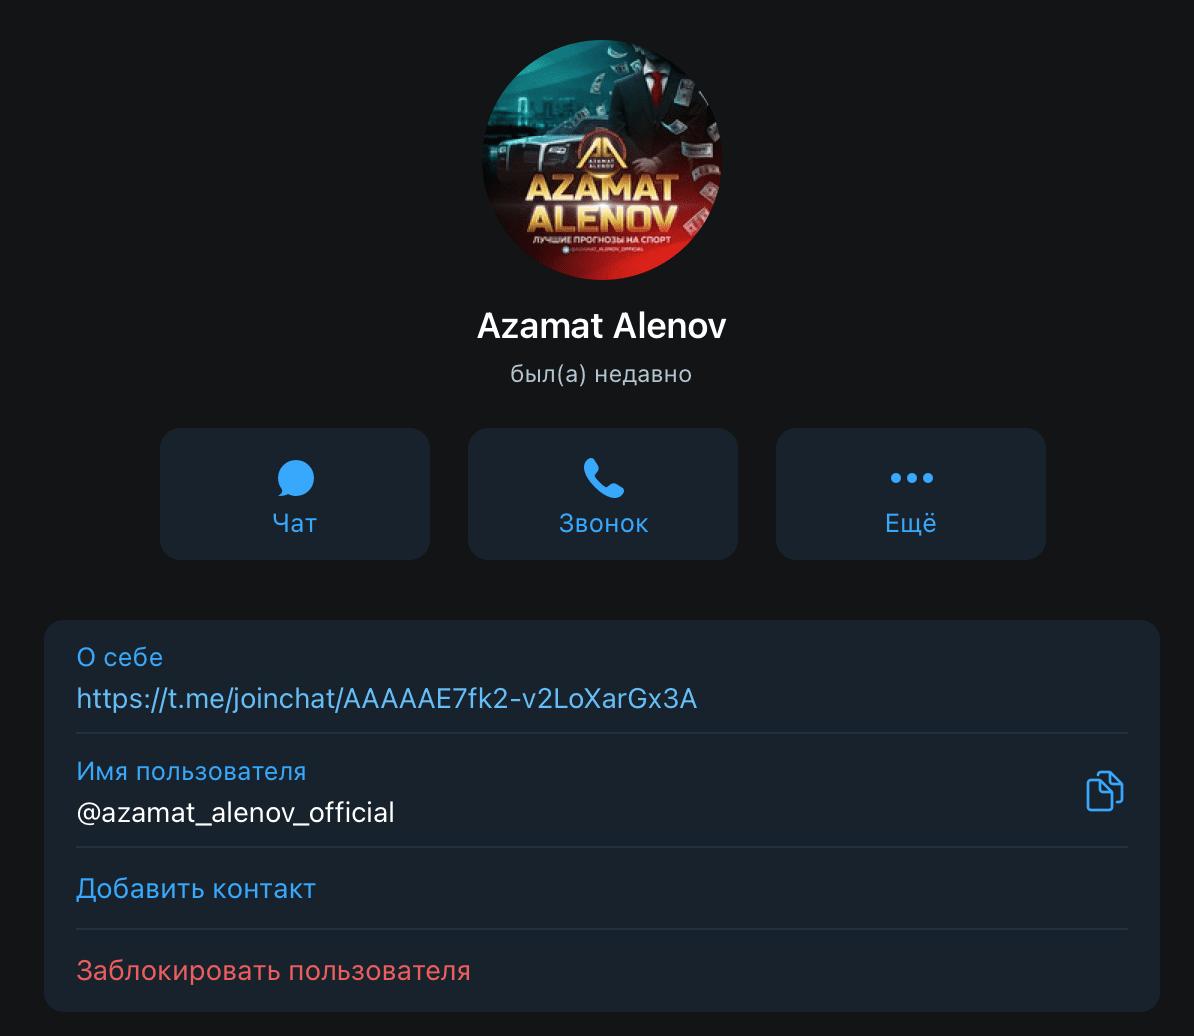 Телеграм канал Азамат Аленов(Azamat Alenov)